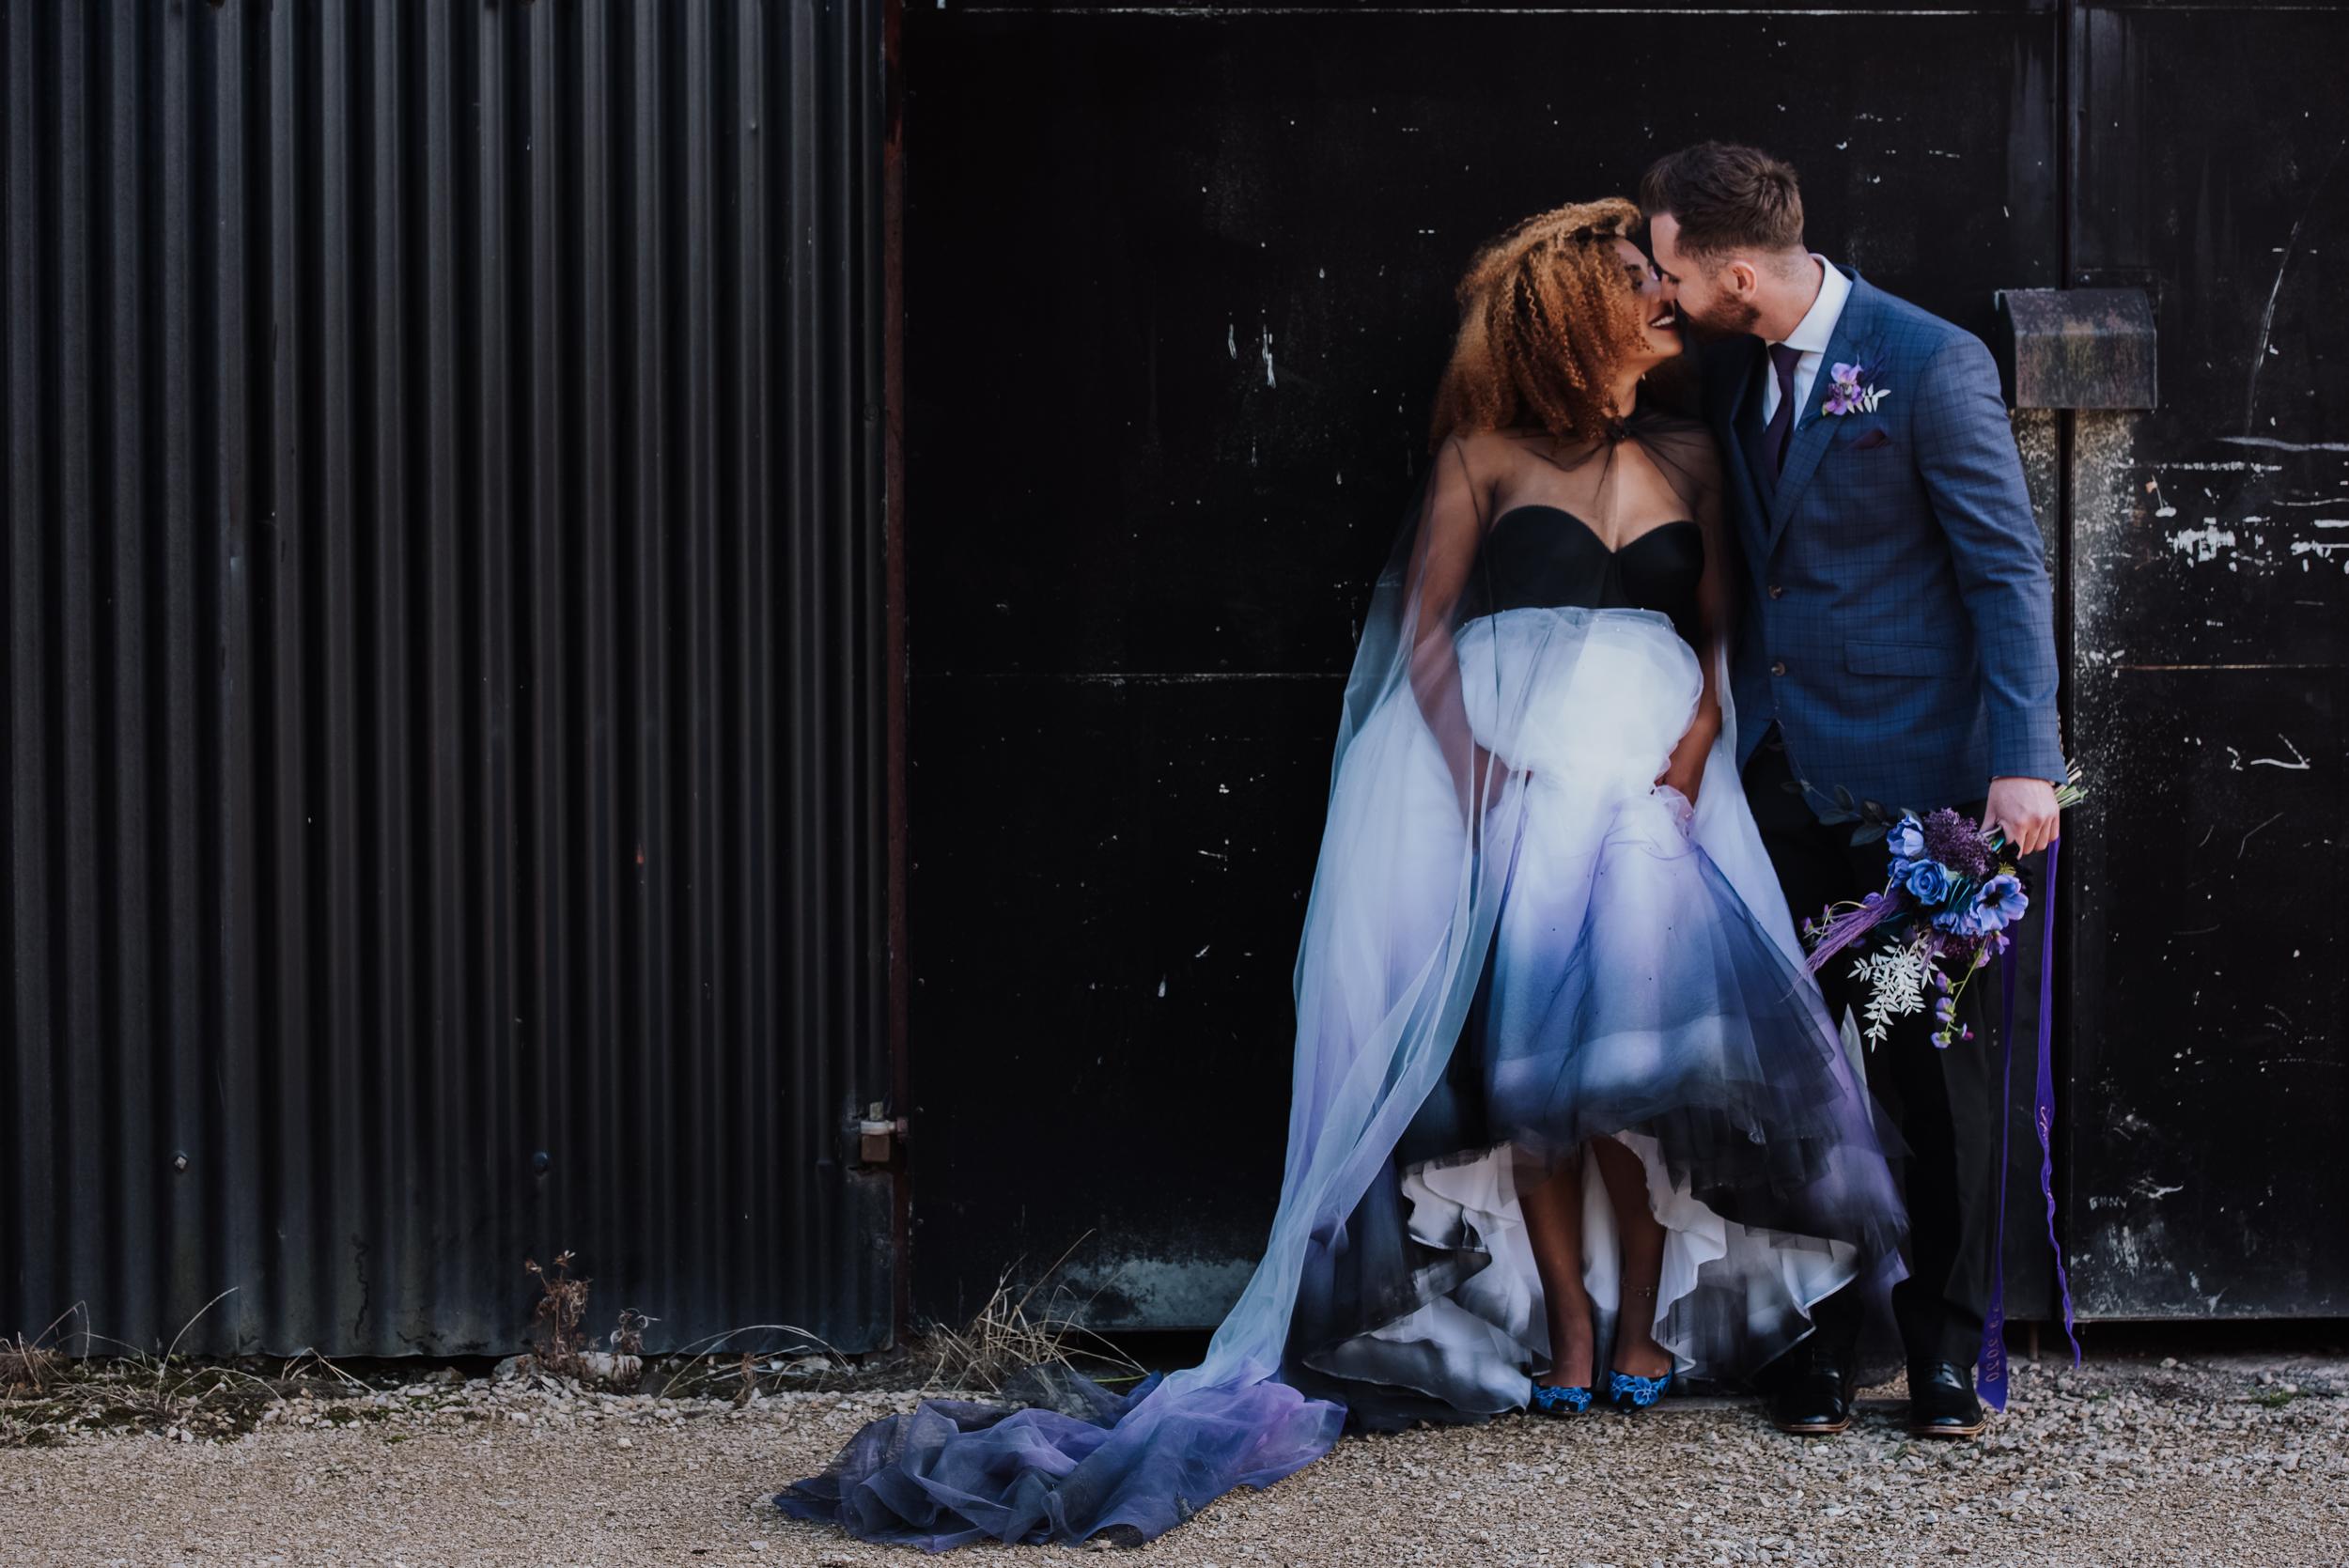 luxury galaxy wedding - black and white wedding dress - dip dye wedding dress - ombre wedding dress - galaxy wedding dress - celestial wedding dress - ombre wedding veil - alternative bridal wear - alternative wedding dress